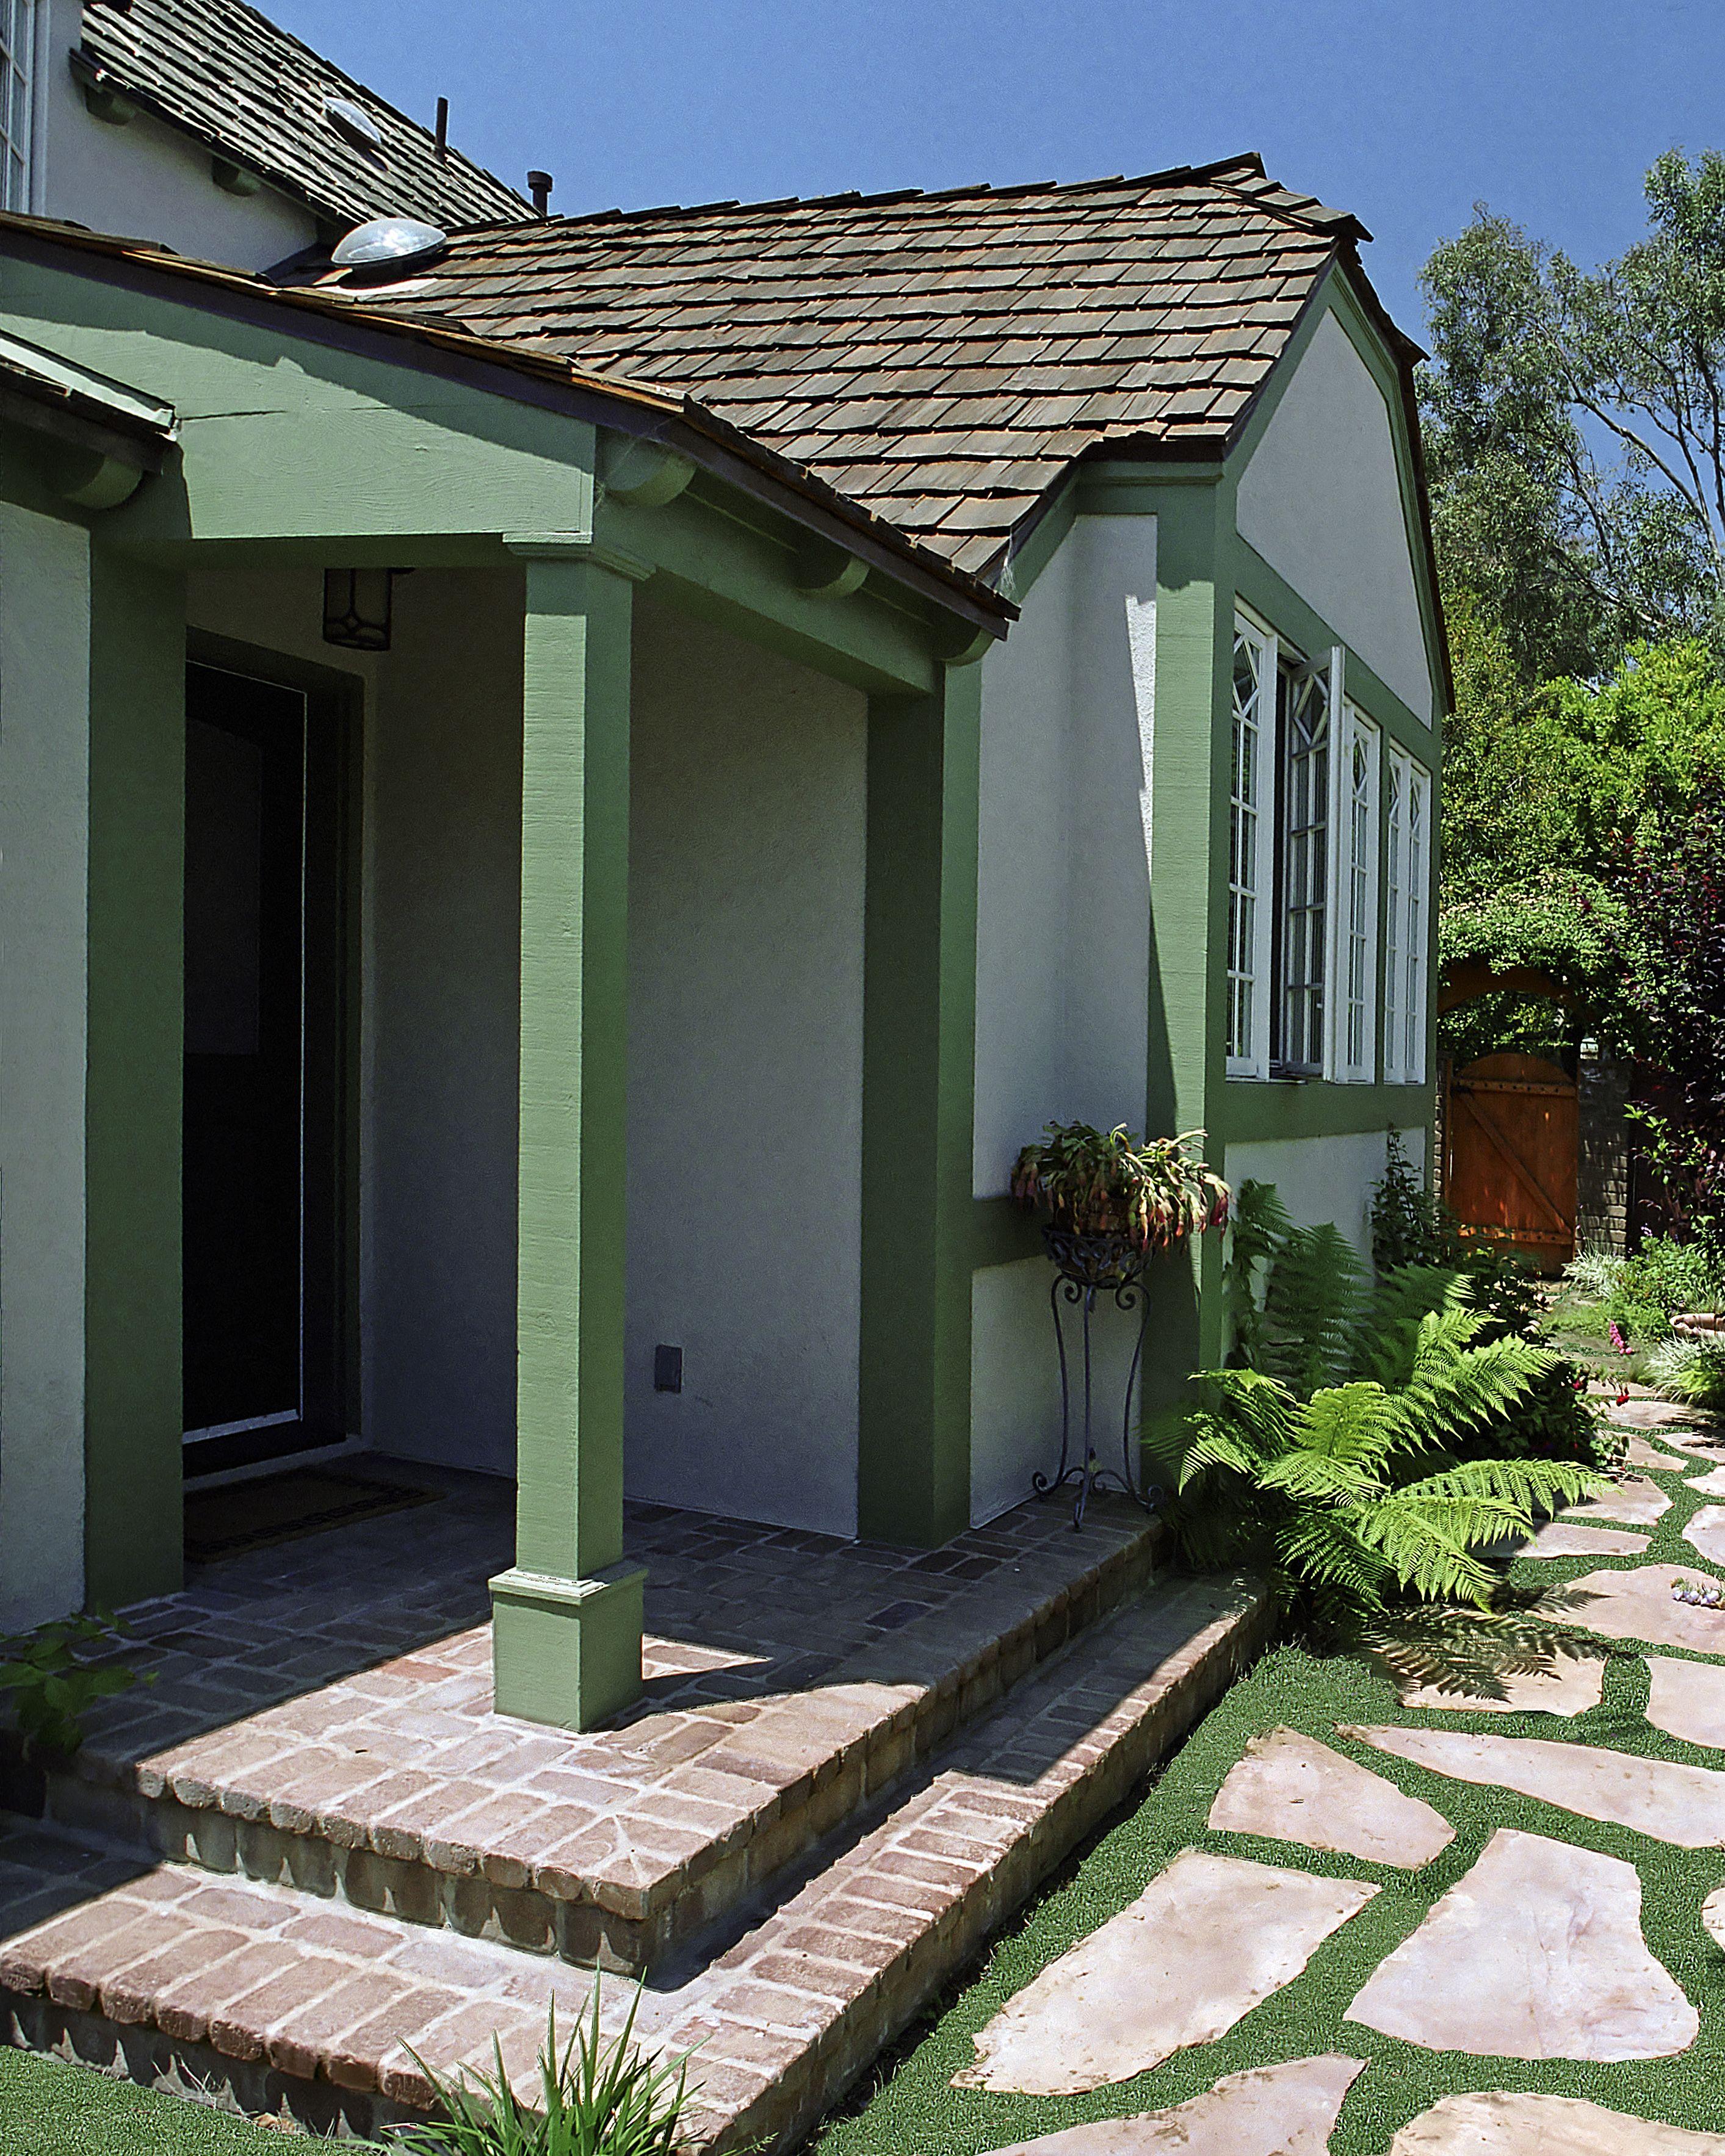 Zieba Builders Home Design Build And General Contractor Exterior Remodel Building Design House Design